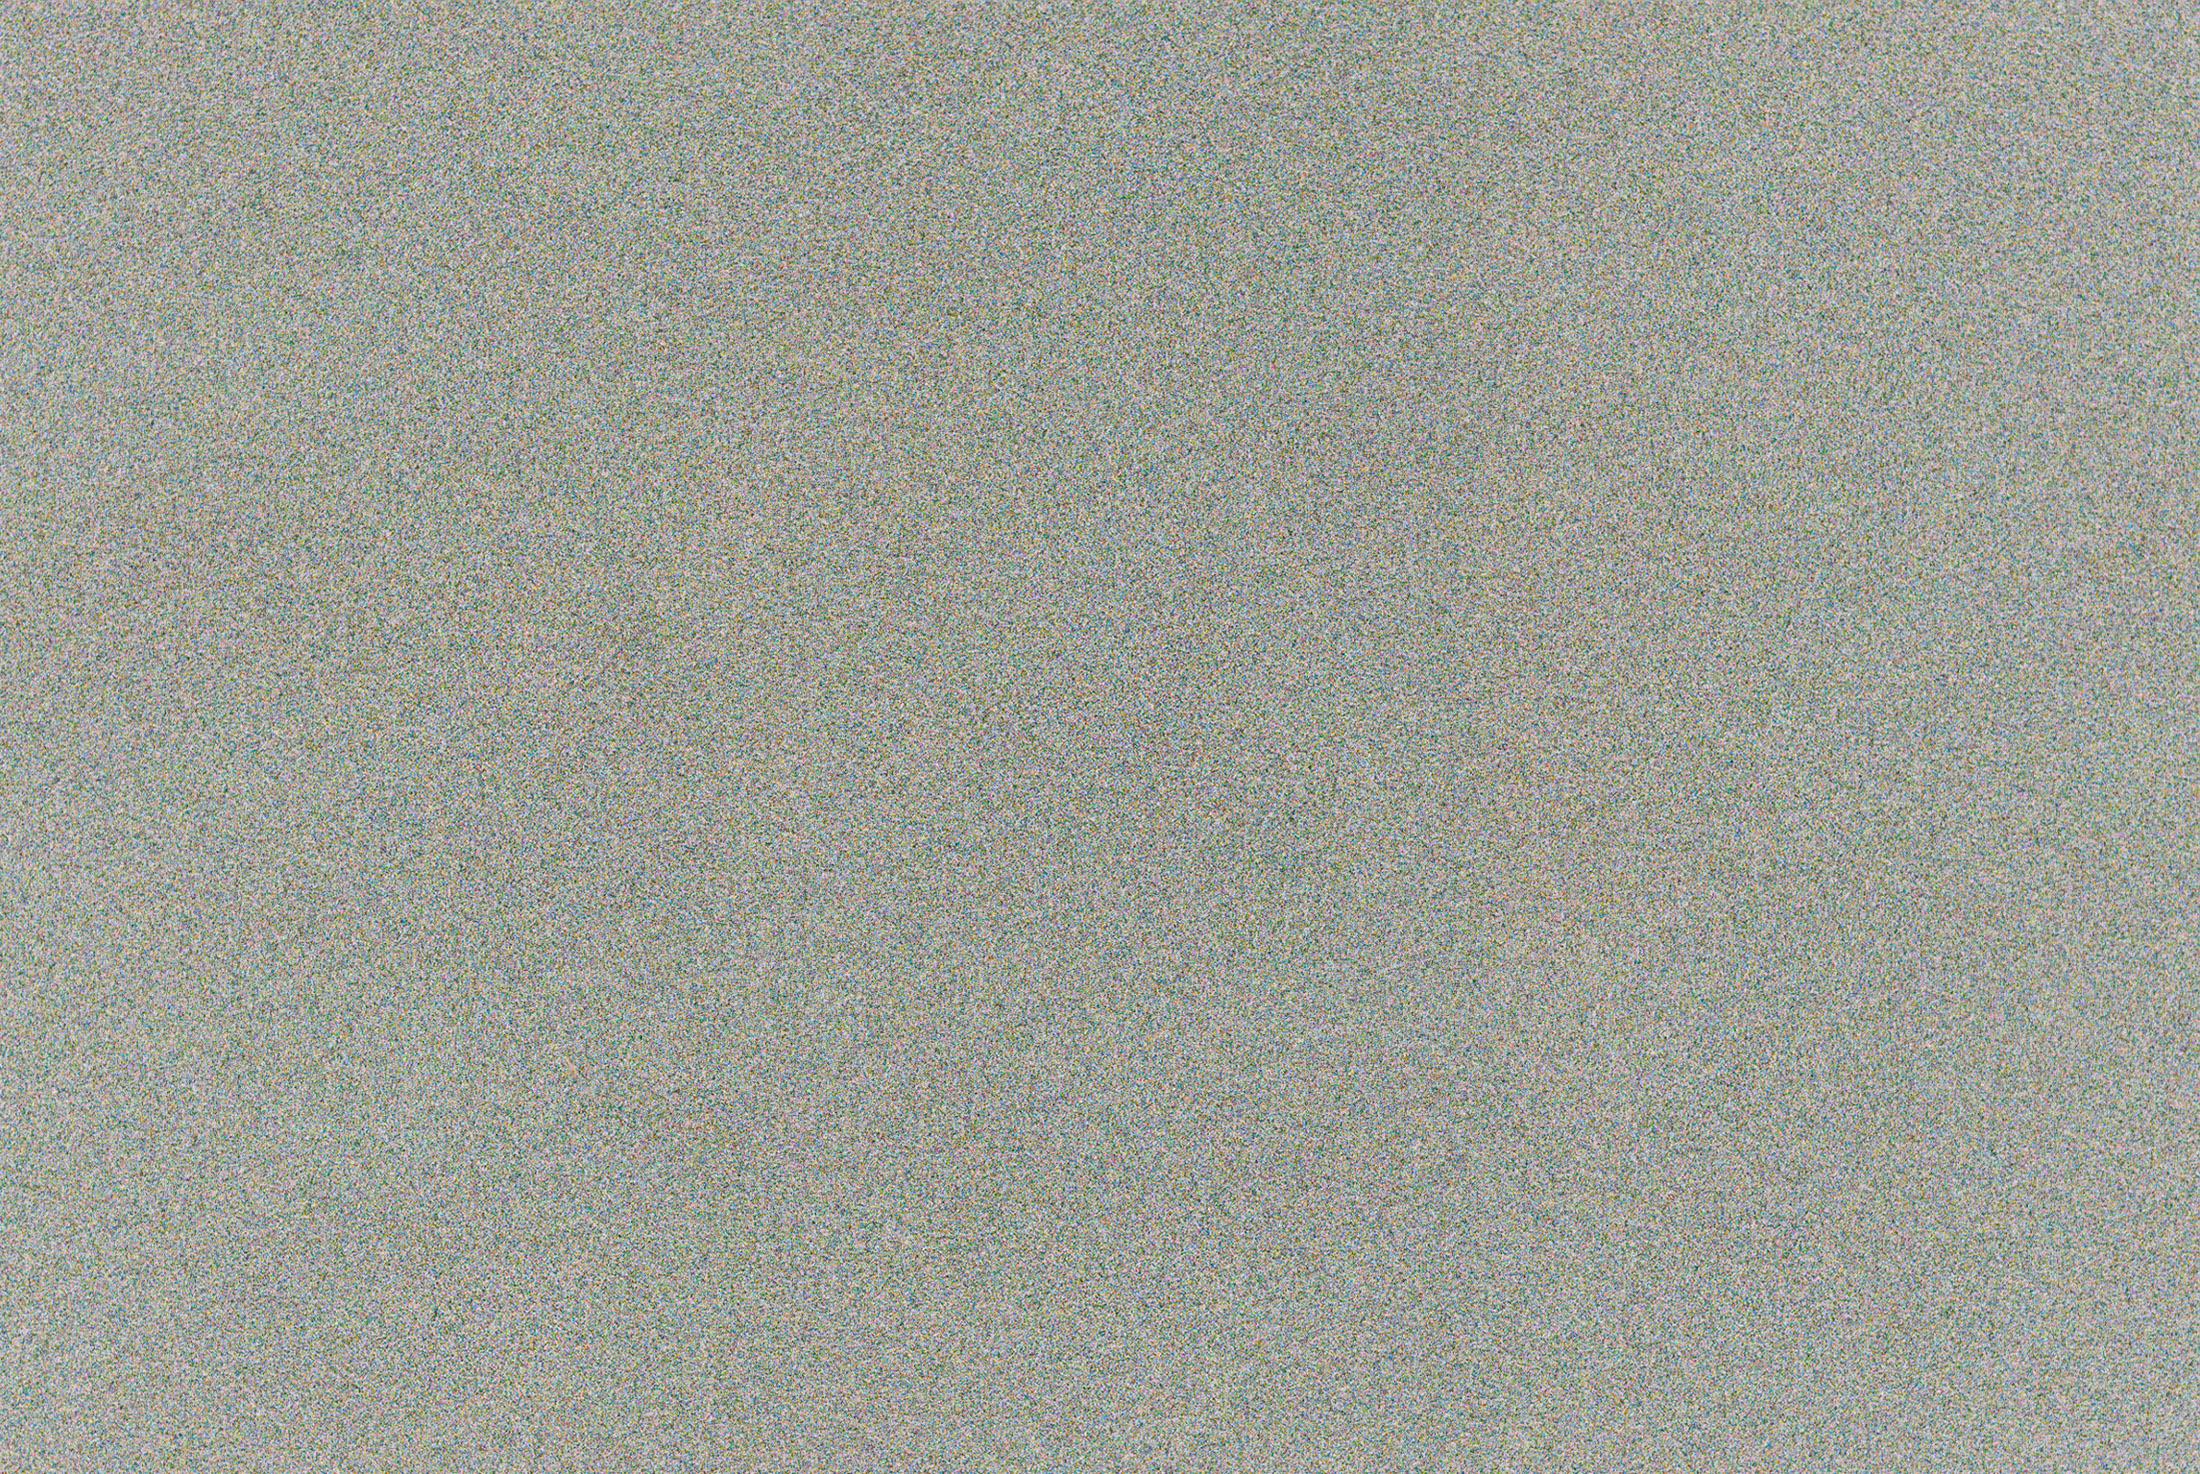 Emmanuelle-Laurent-012.jpg